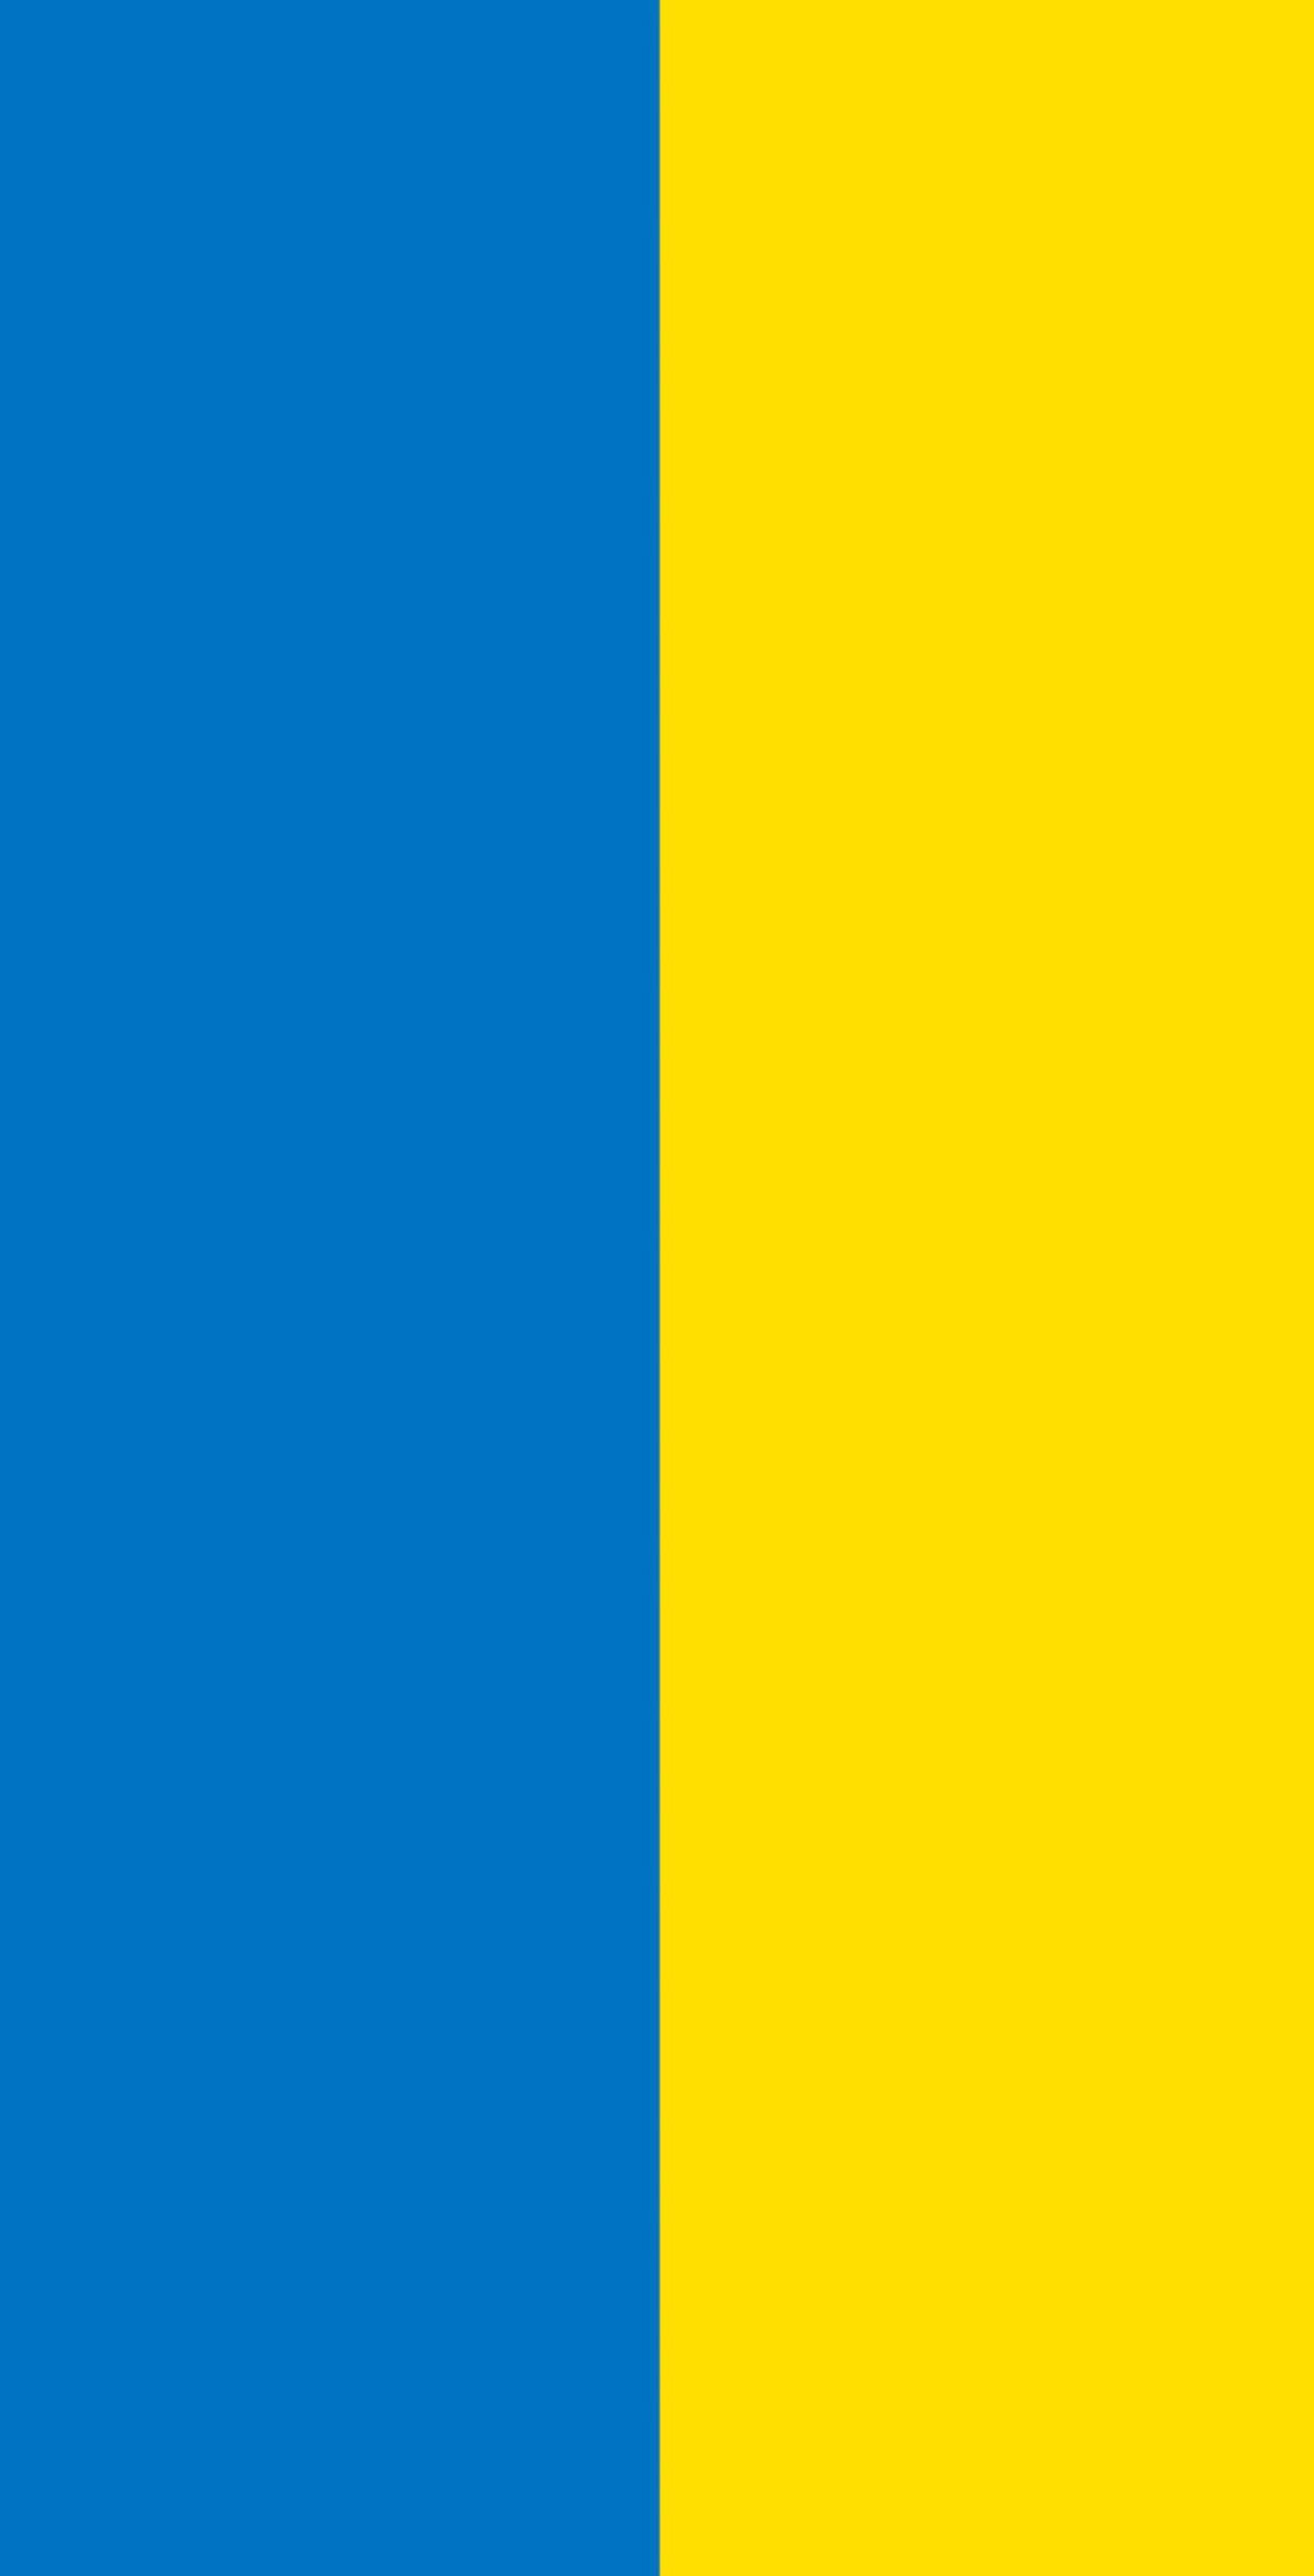 Ukraine Flag Themed 2x4 Custom Cornhole Board Set with bags | Custom Corn Hole | Bag Toss | Corn Toss | Bean Bag Toss